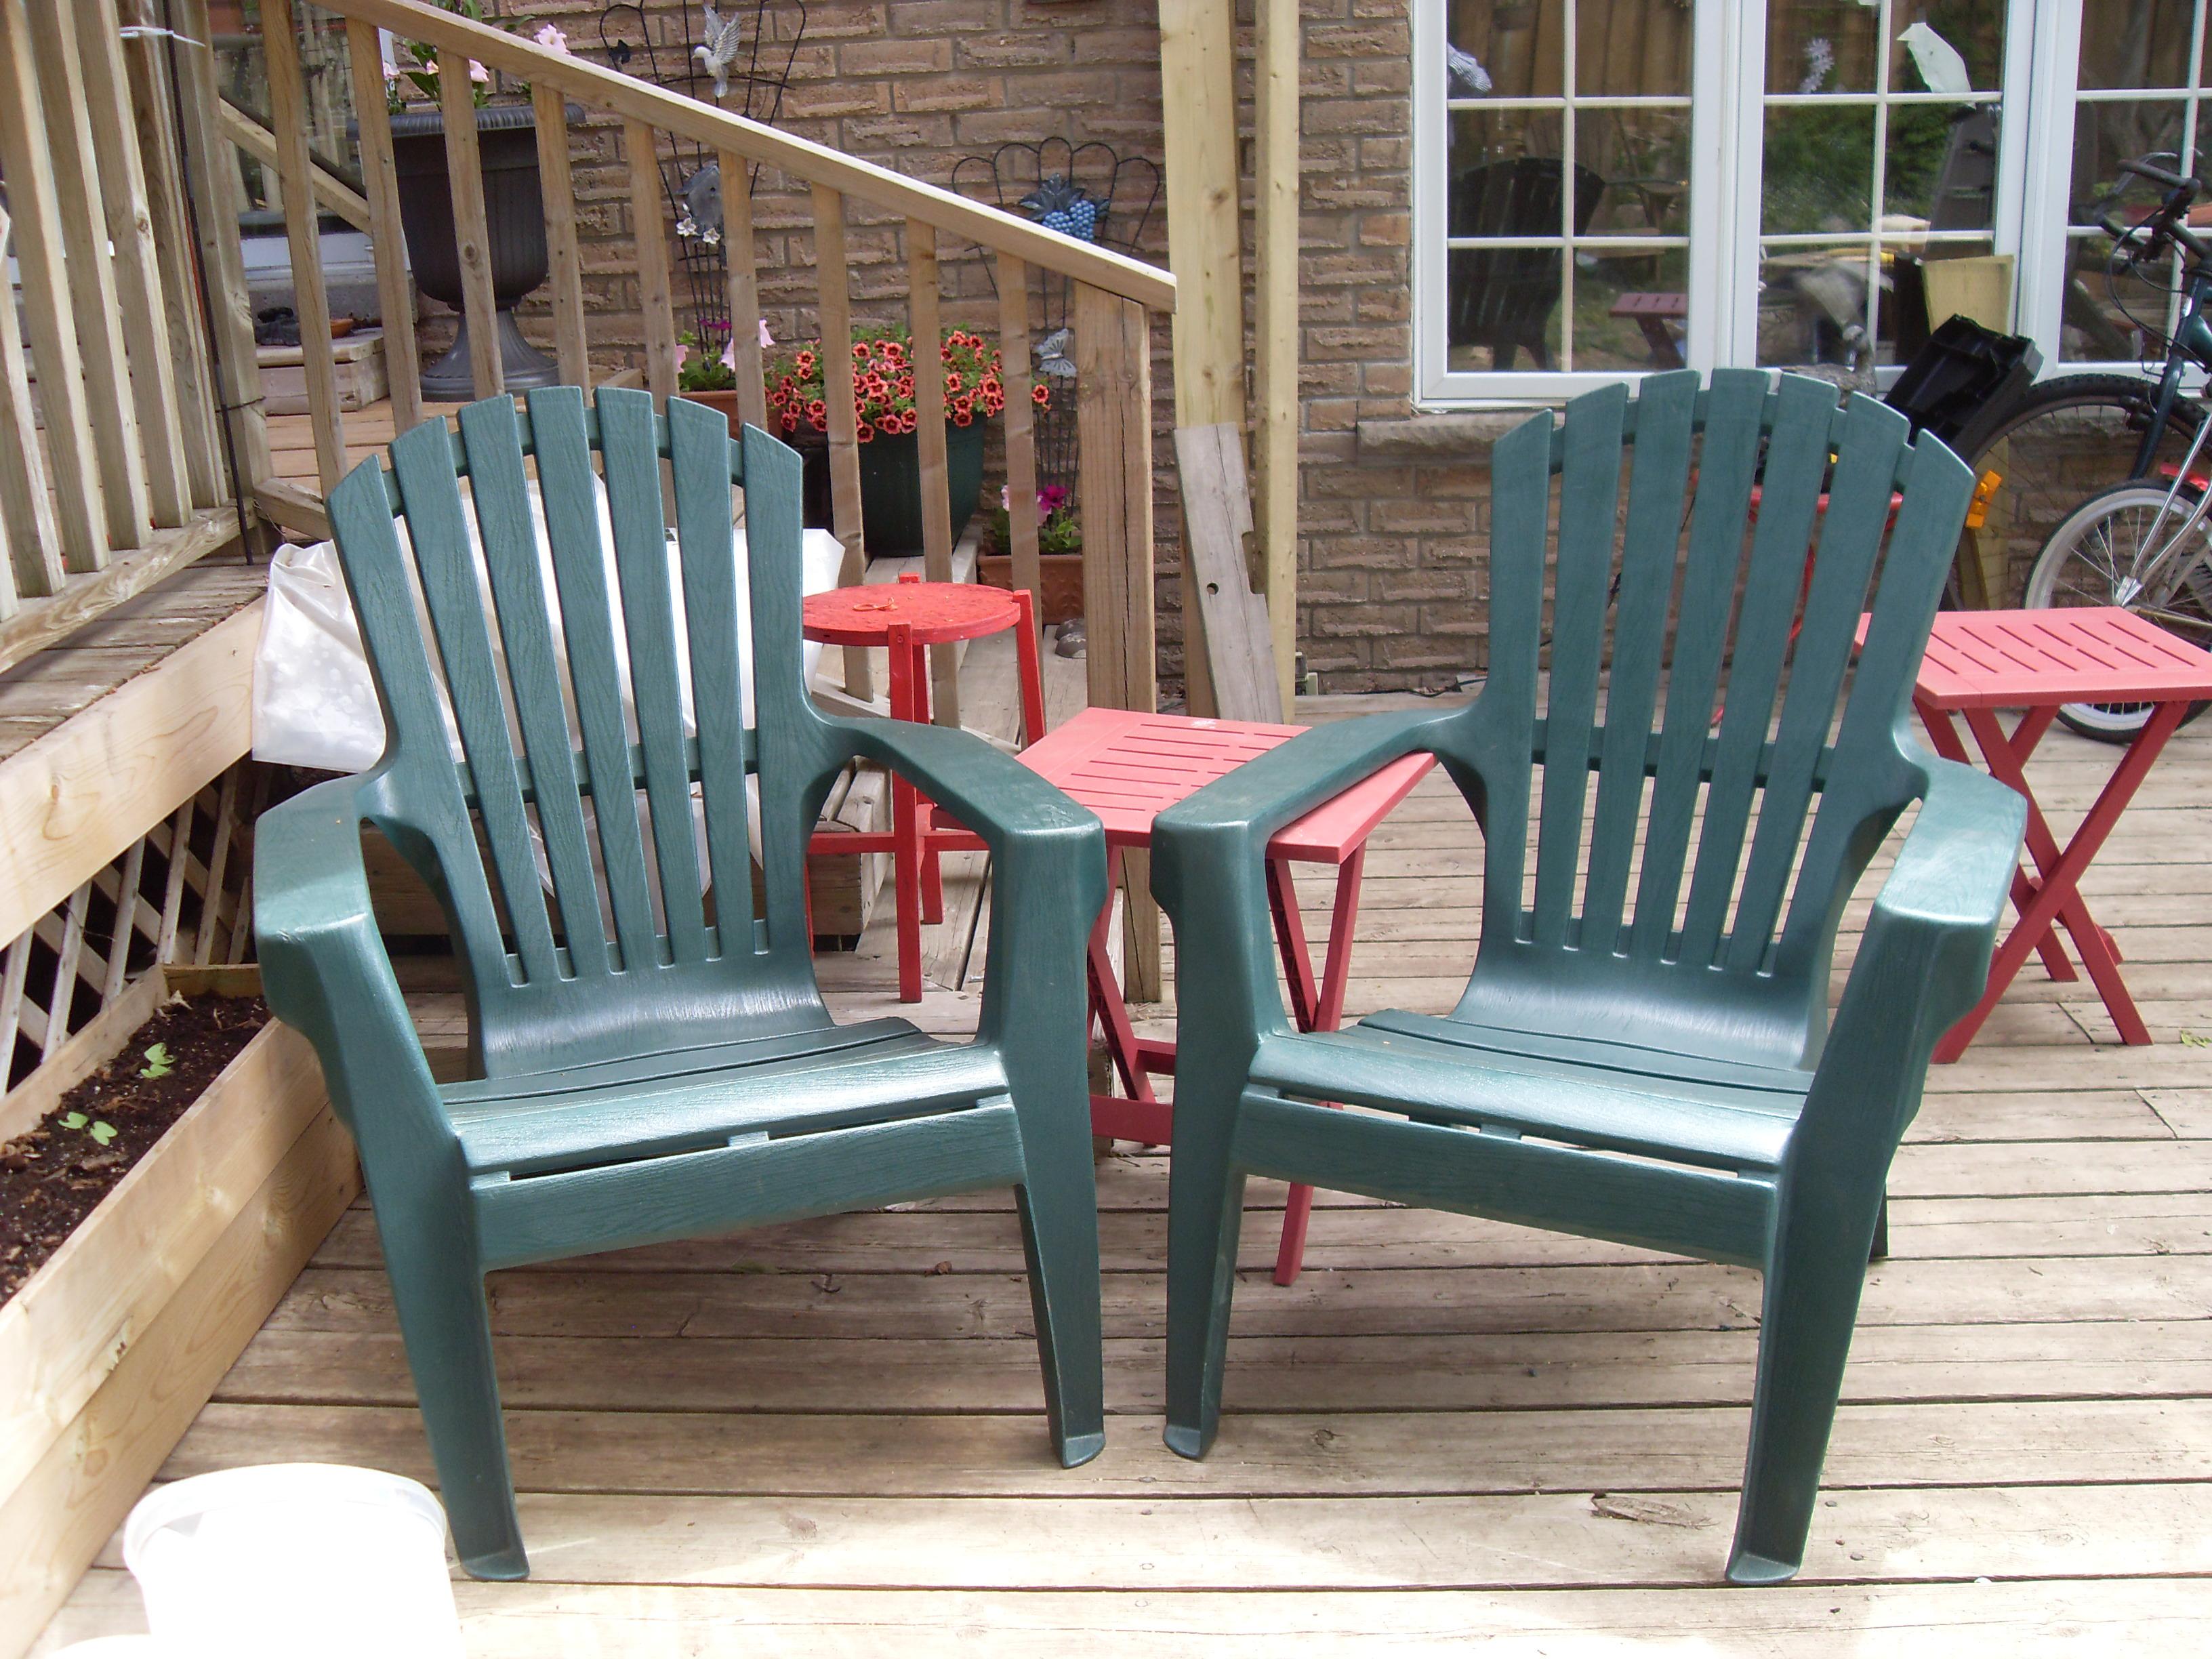 into an oxidized pvc deck chair ready